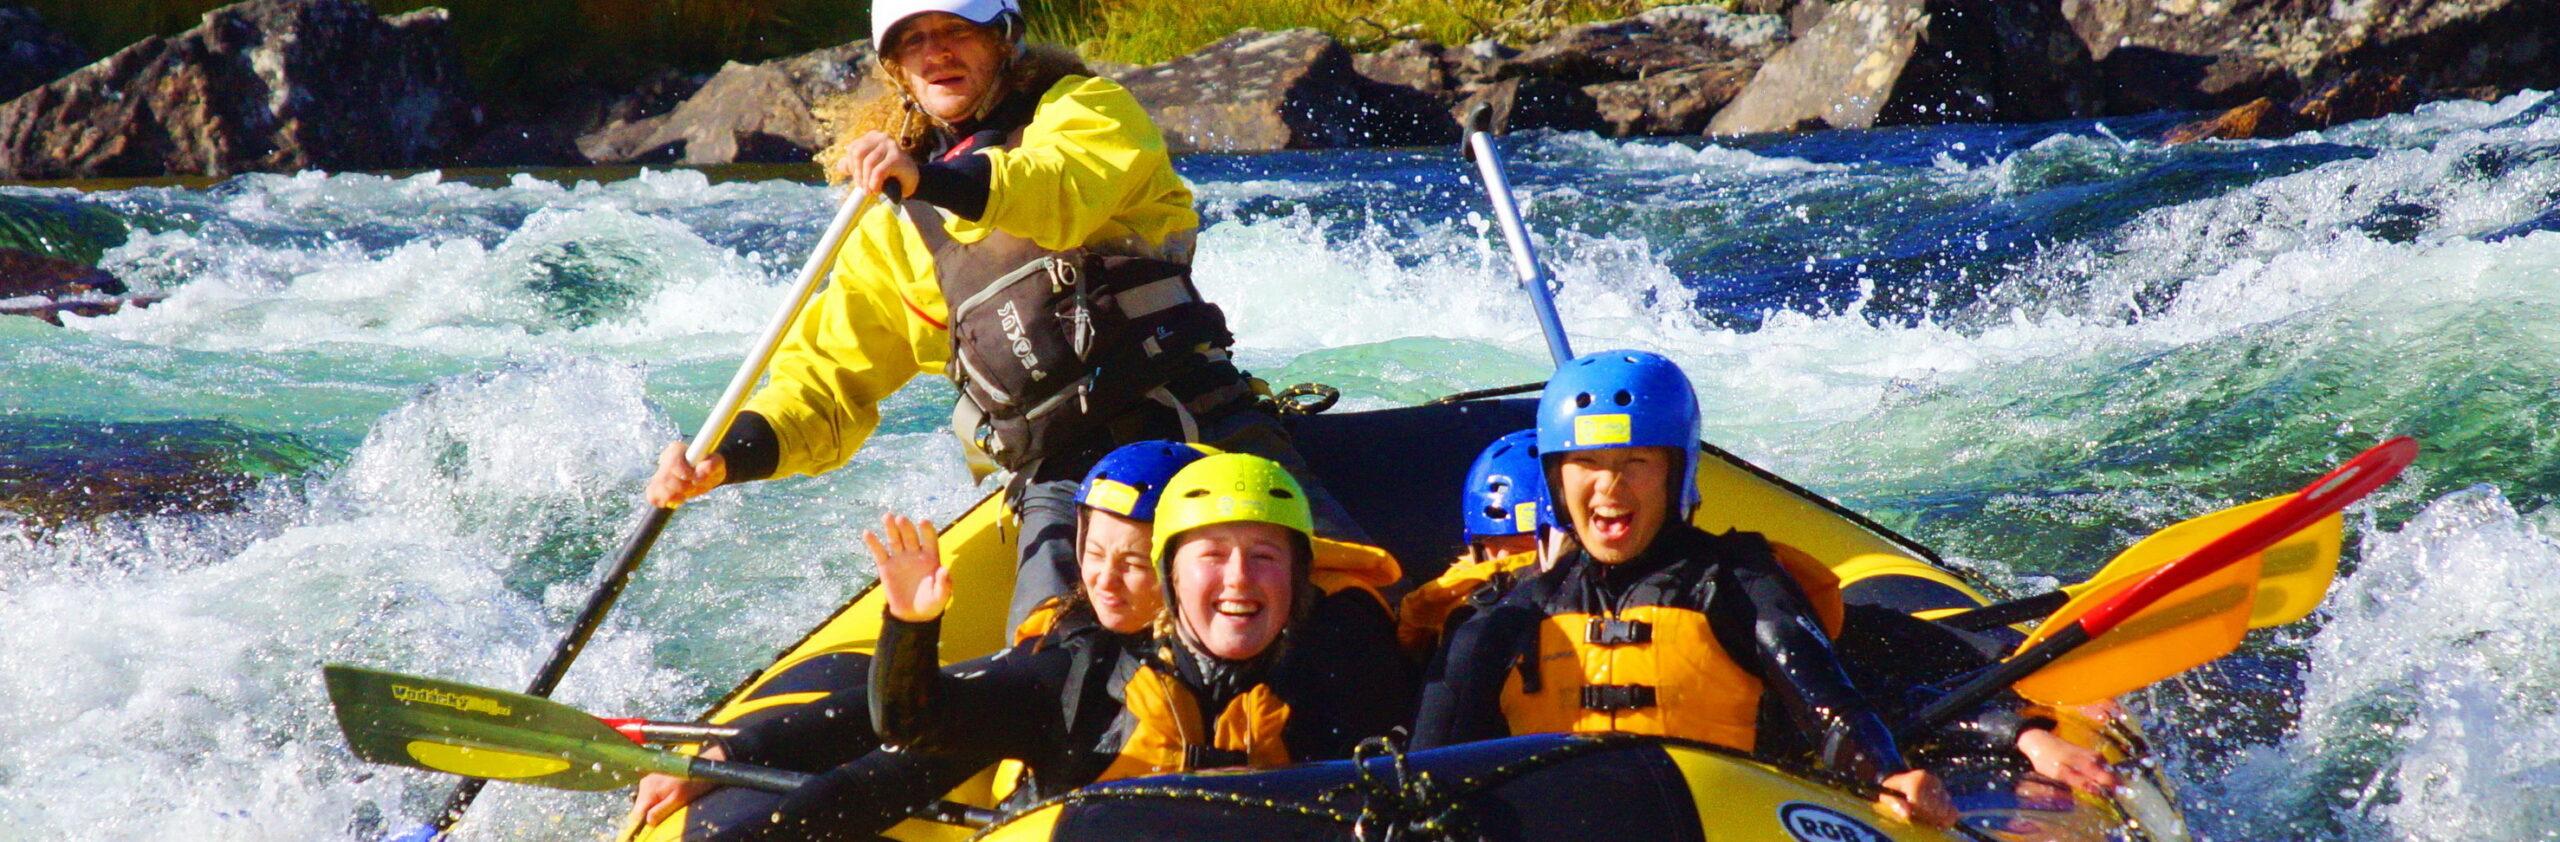 rafting norge rafting geilo dagali rafting dagali opplevelser serious fun